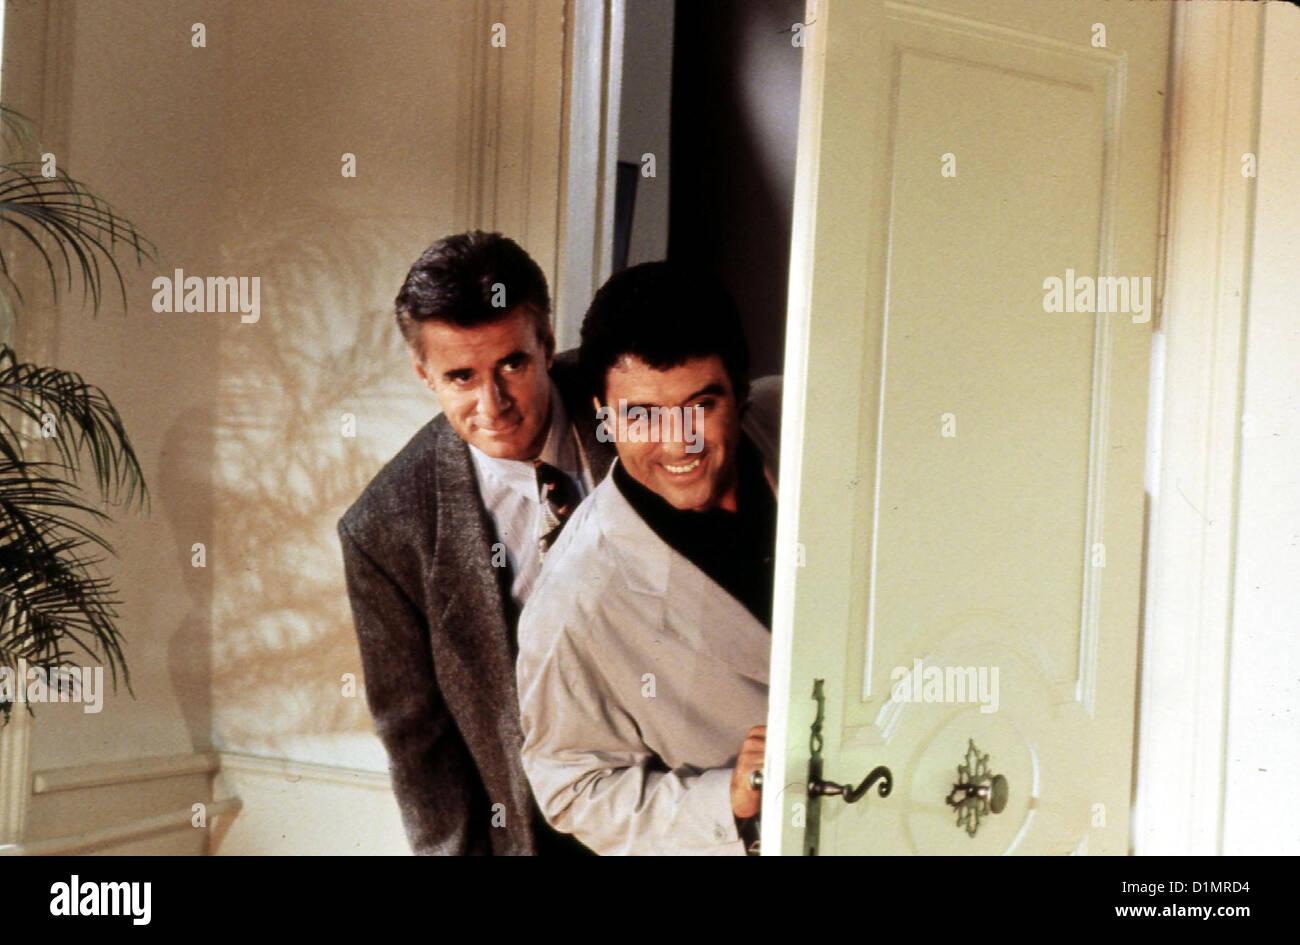 Original Oder Faelschung  In Frame  Don Stuart (Lyman Ward), David Cleveland (Ian McShane) *** Local Caption *** Stock Photo